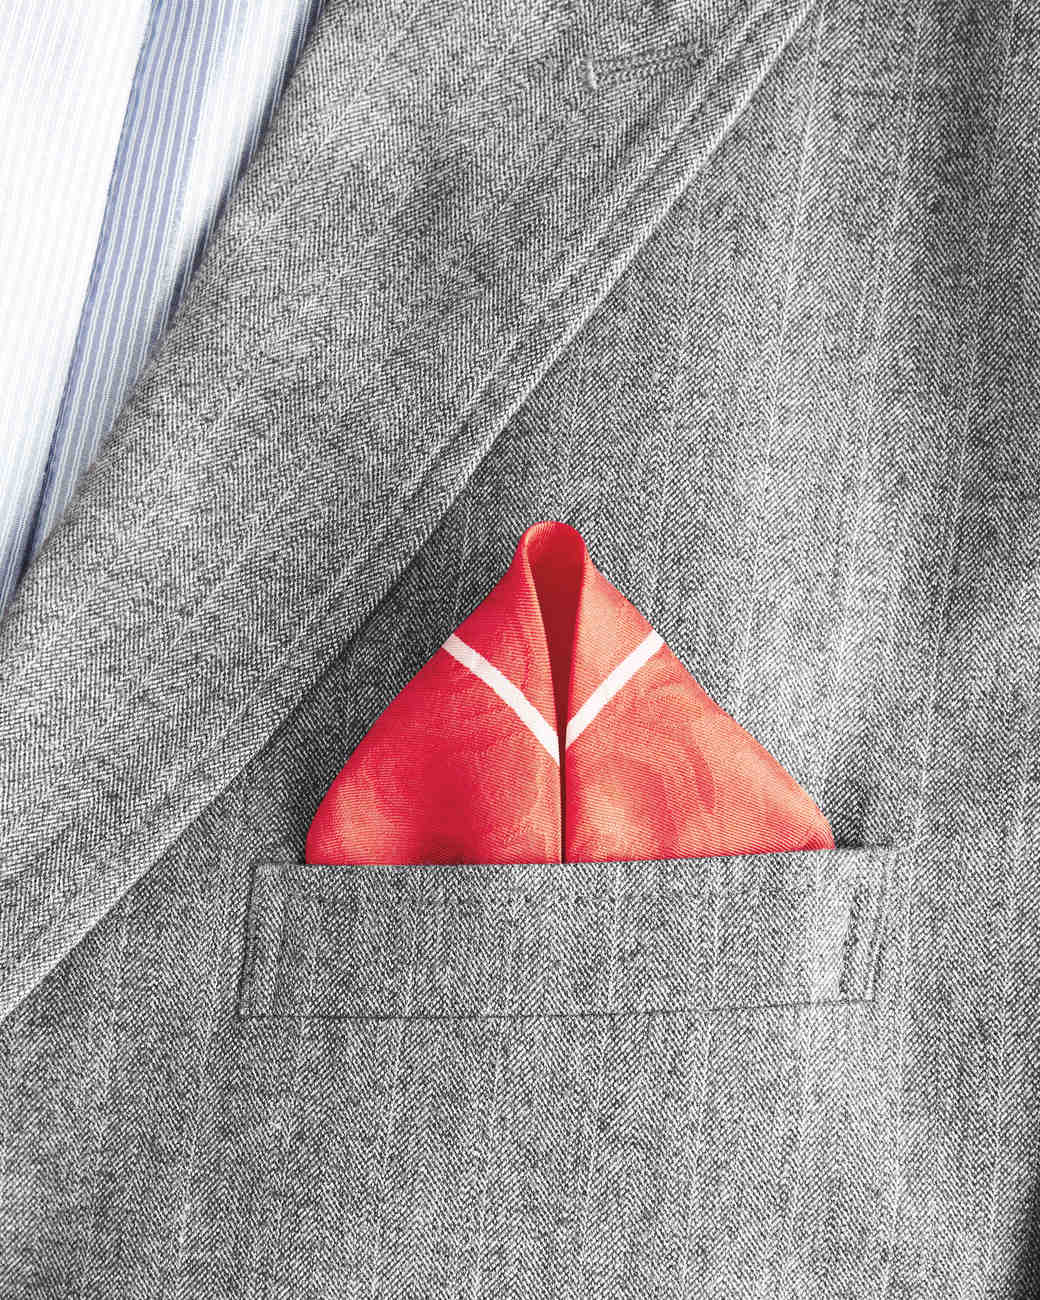 scarf-in-pocket-203-d111649.jpg